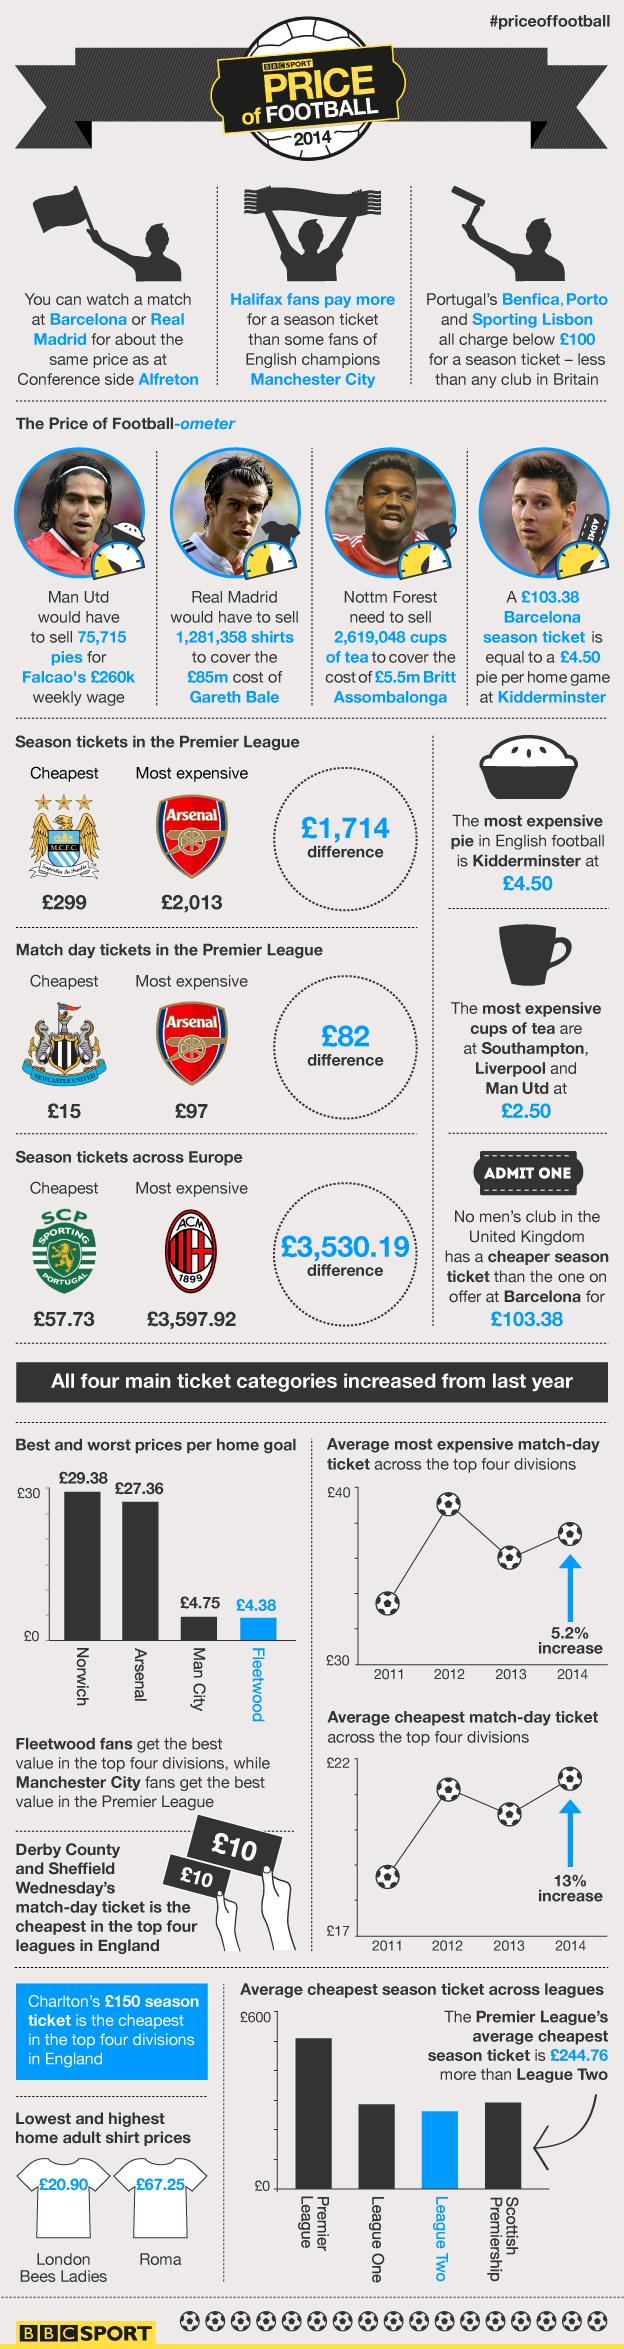 BBC The price of football priceoffootball Bbc sport